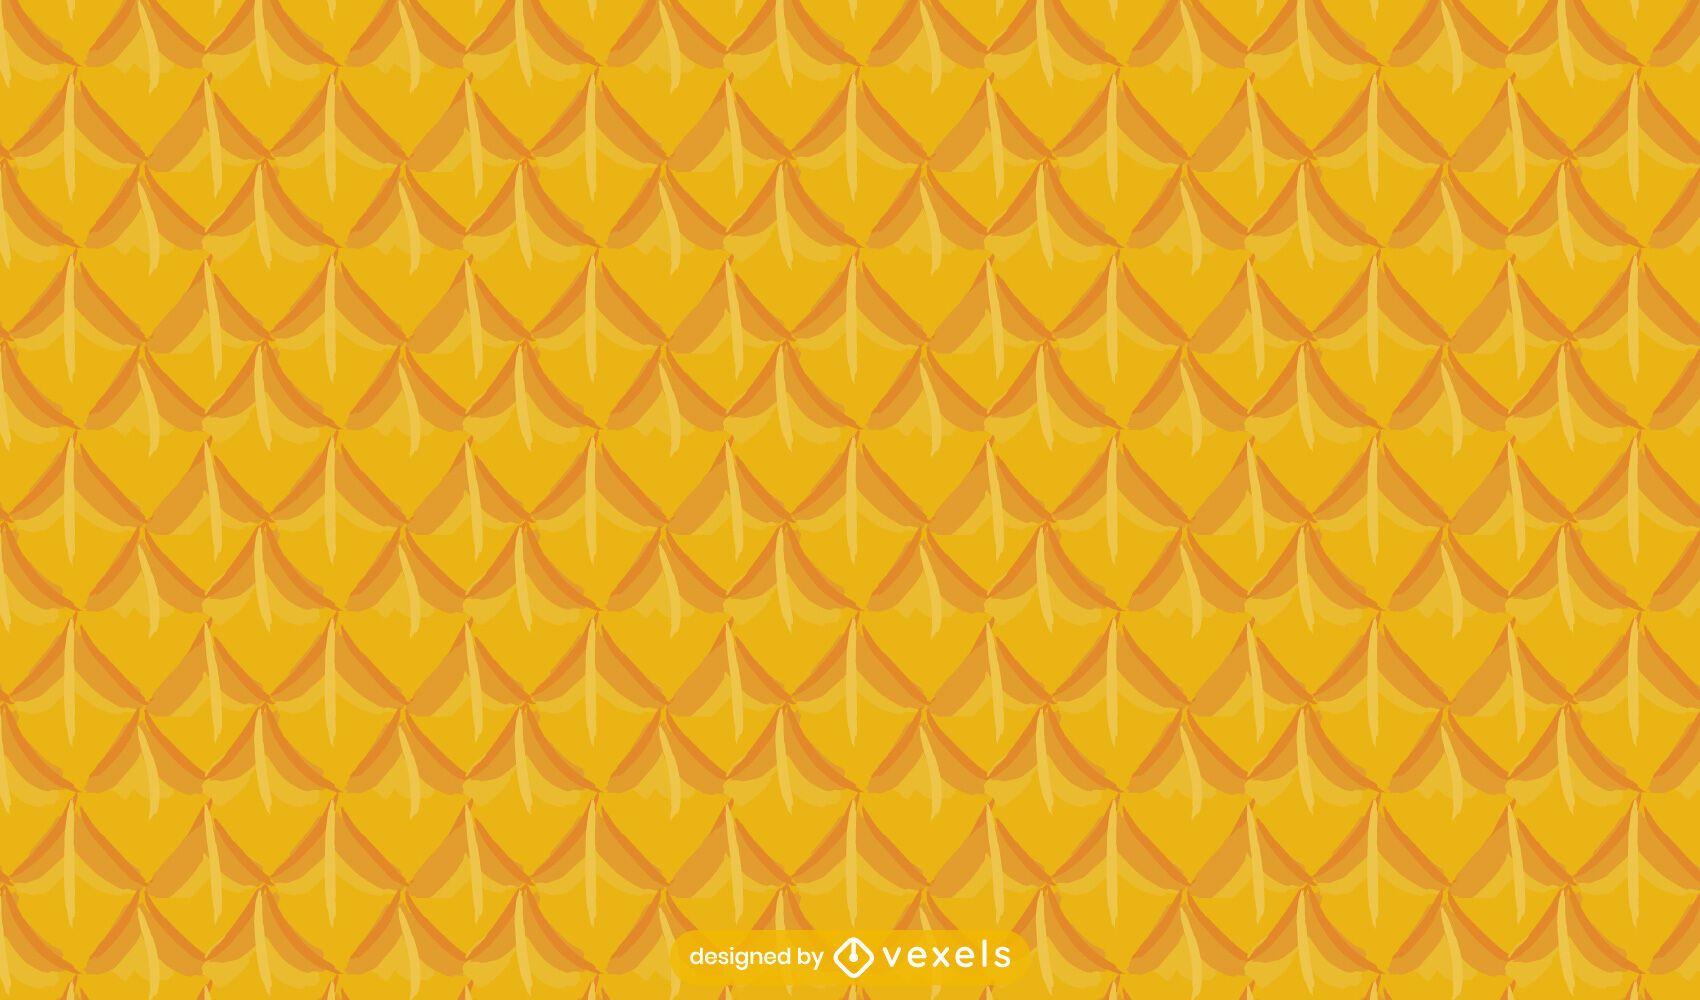 Diseño de patrón de comida de fruta de piña